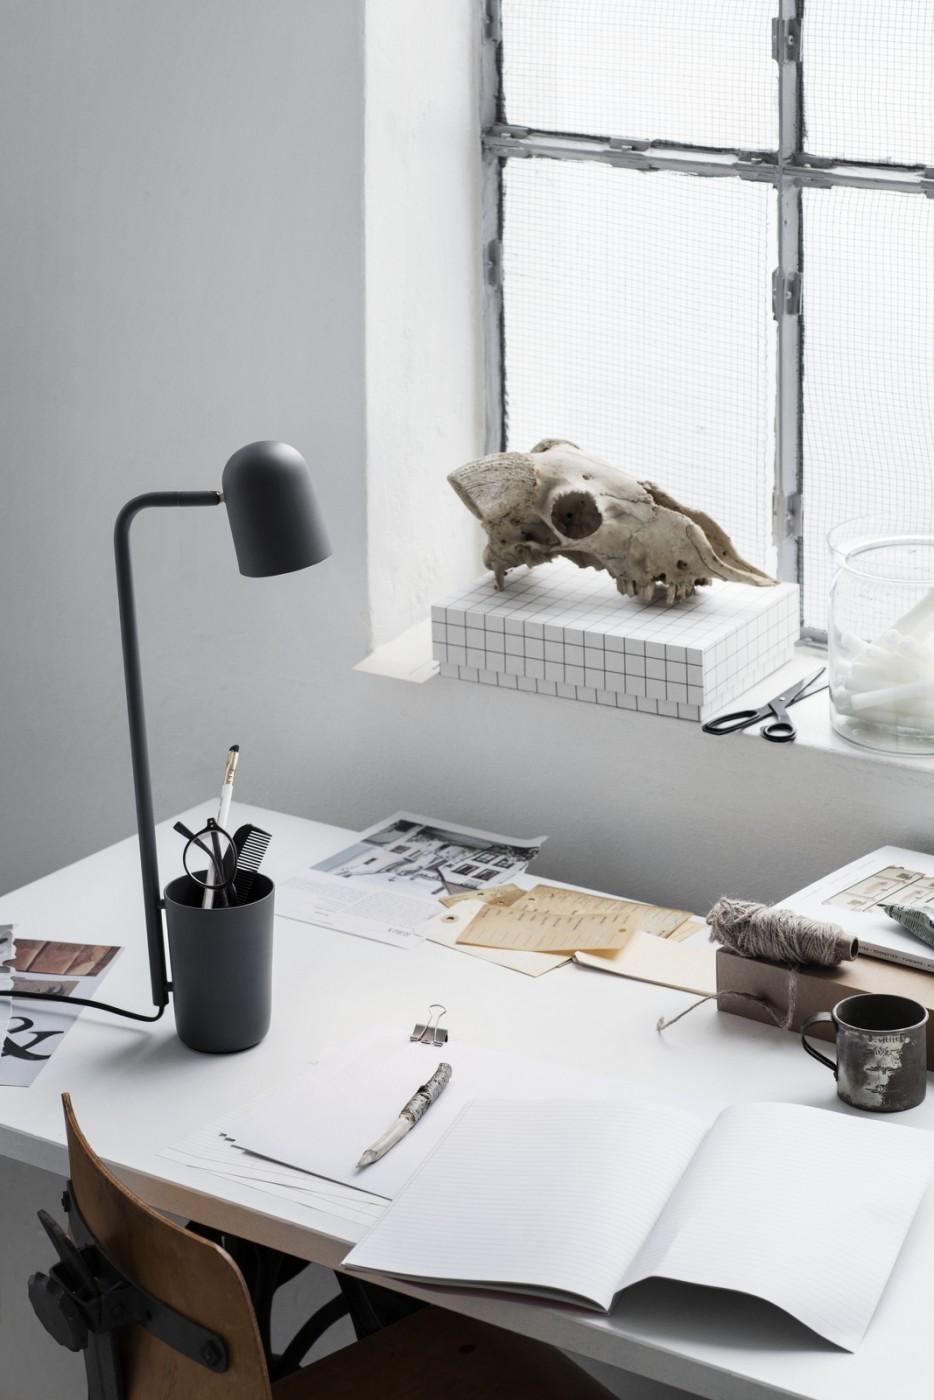 Buddy_Dark_Grey_on_desk_portrait-Low-res_Photo_Chris-Tonnesen-934x1400.jpg